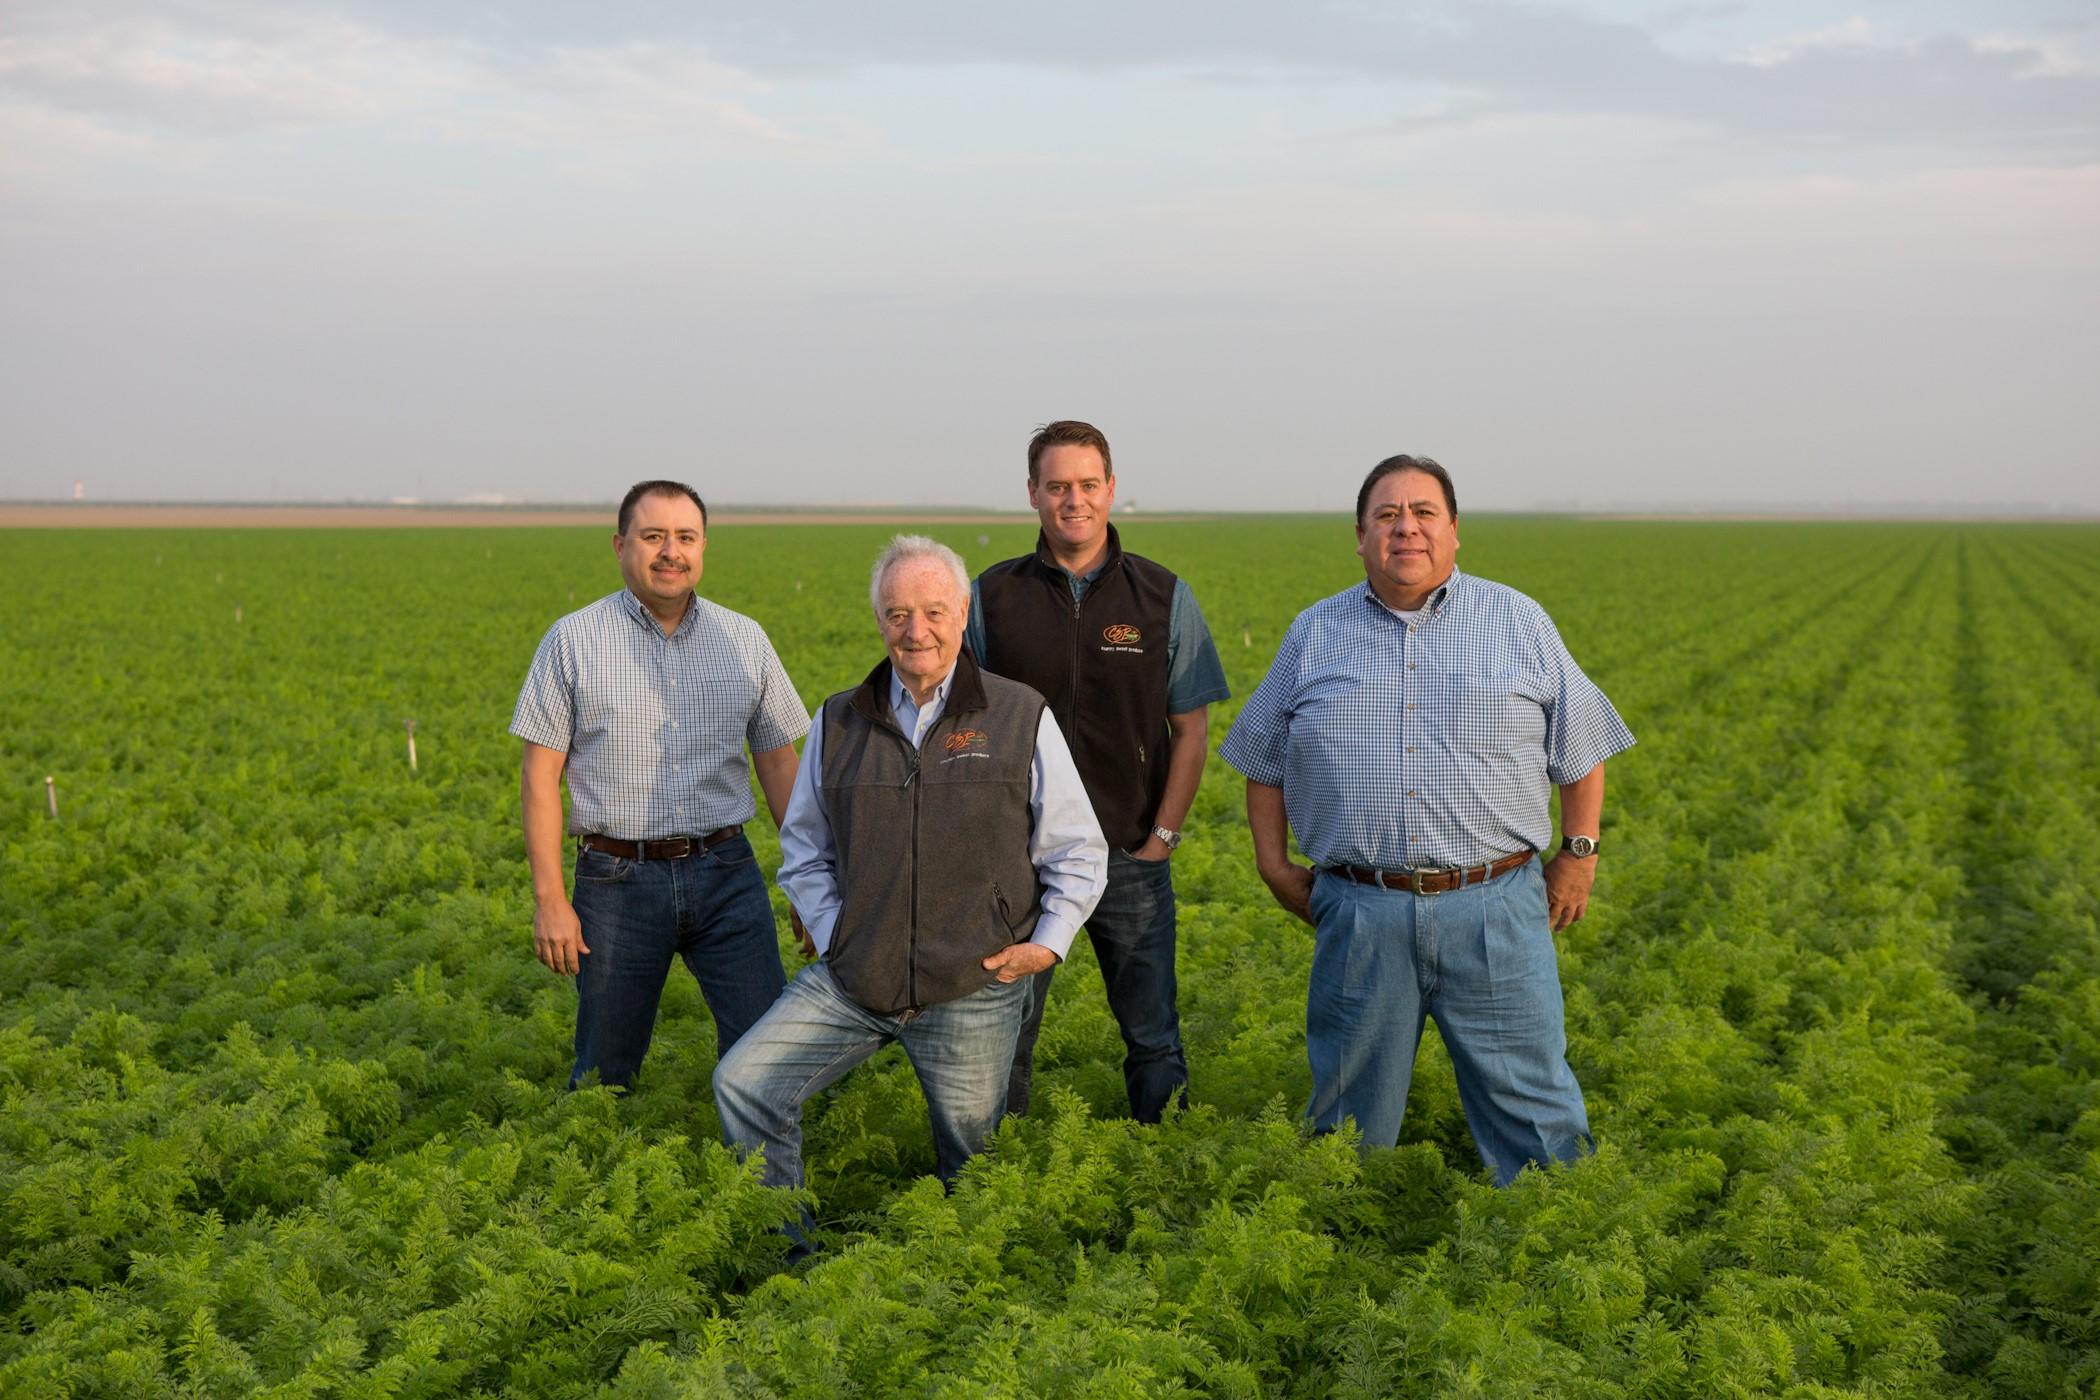 Tito Martinez, Valpredo Farms & Country Sweet Produce